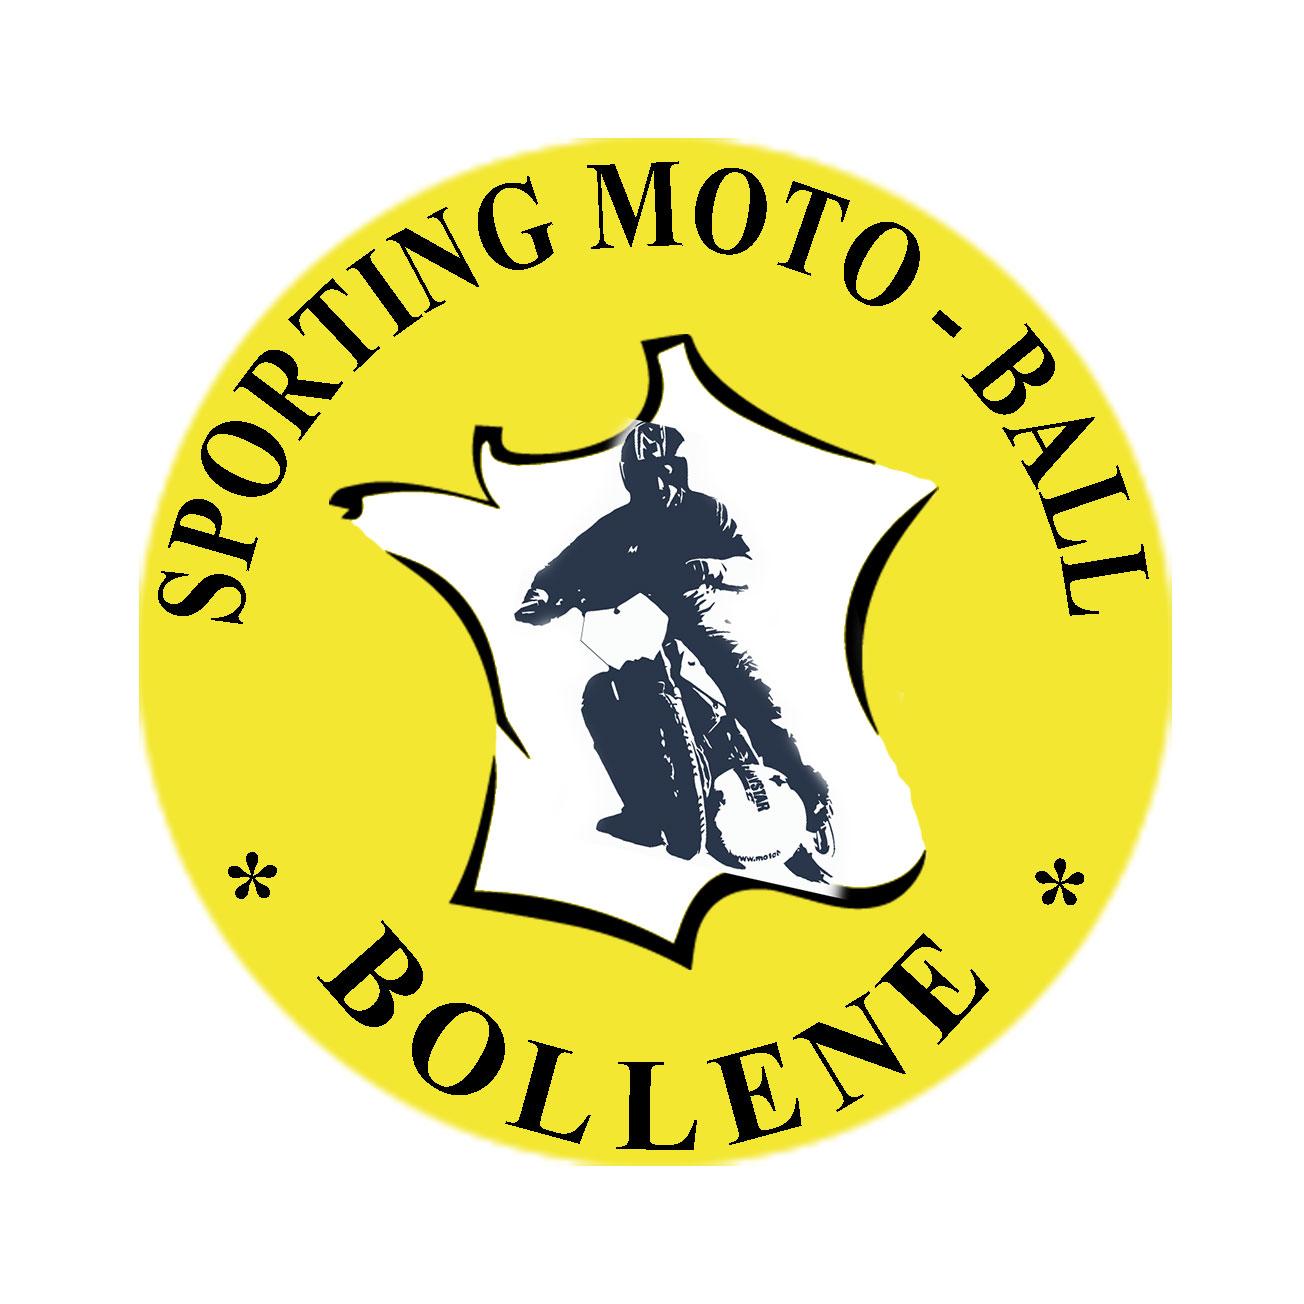 SMB BOLLENE